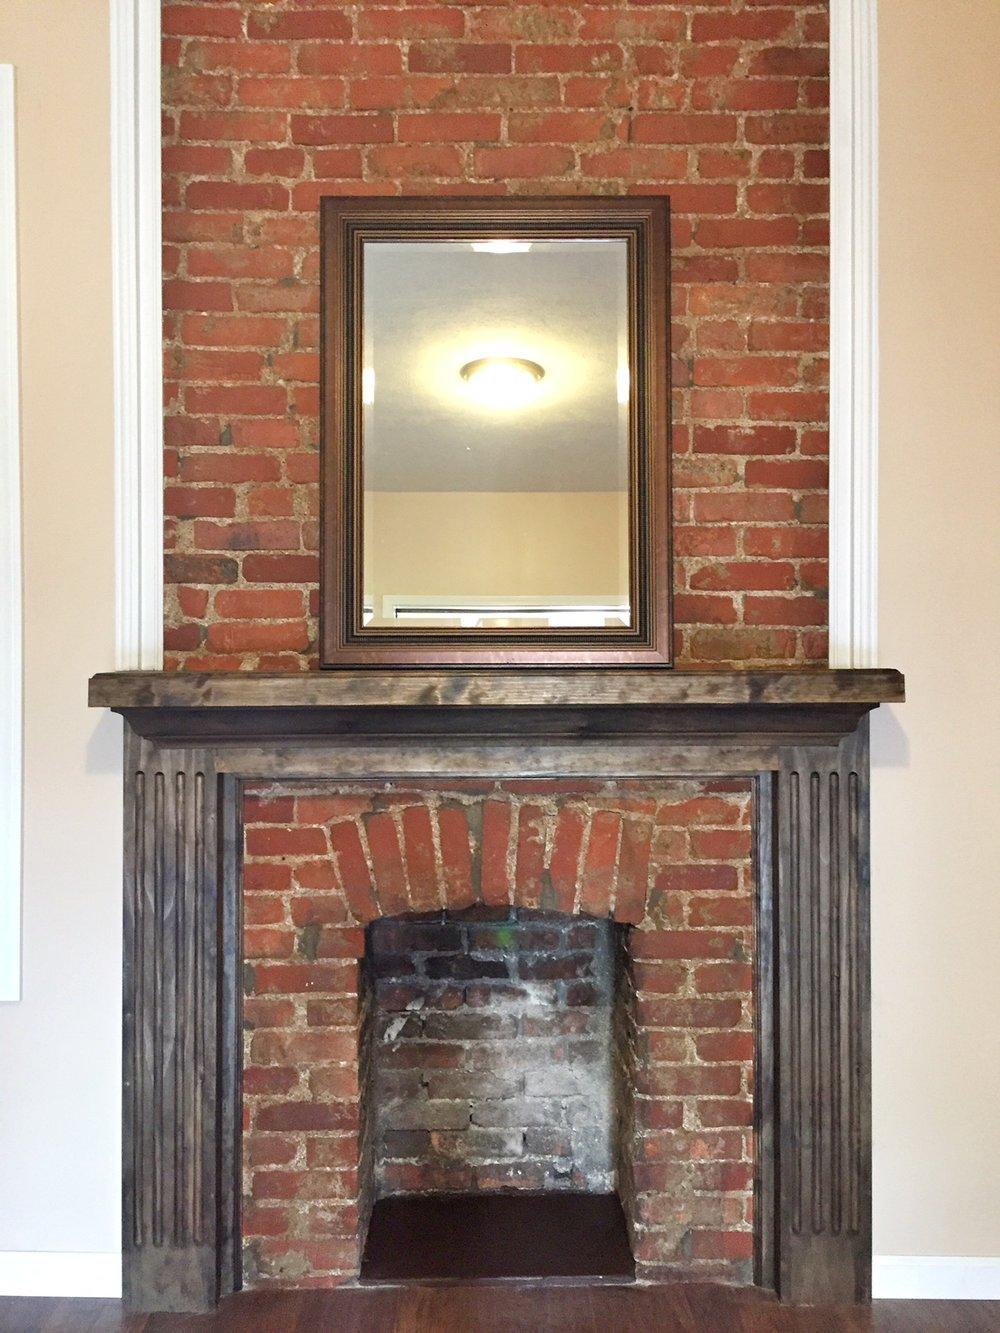 Pville1-fireplace2.jpg